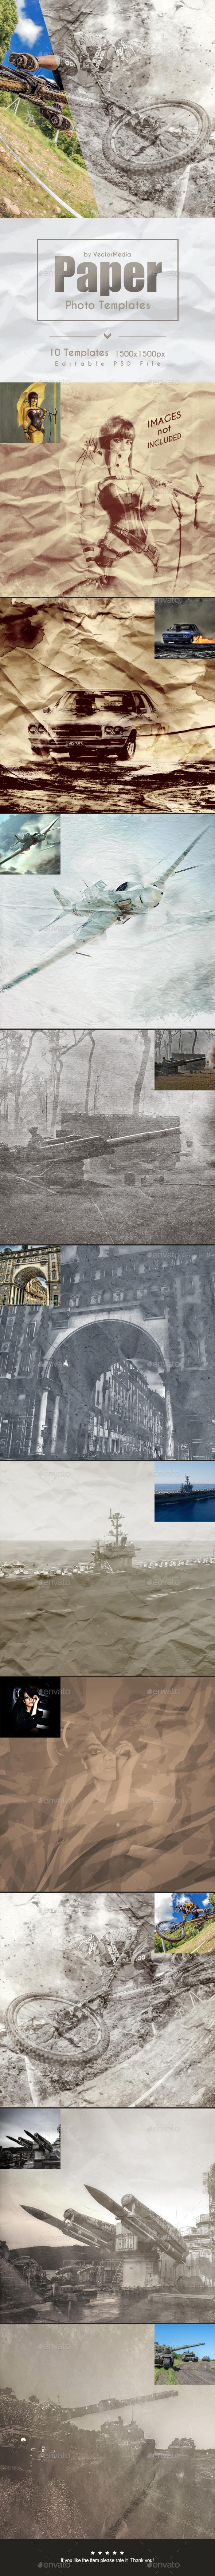 Paper - Photo Templates (Artistic)